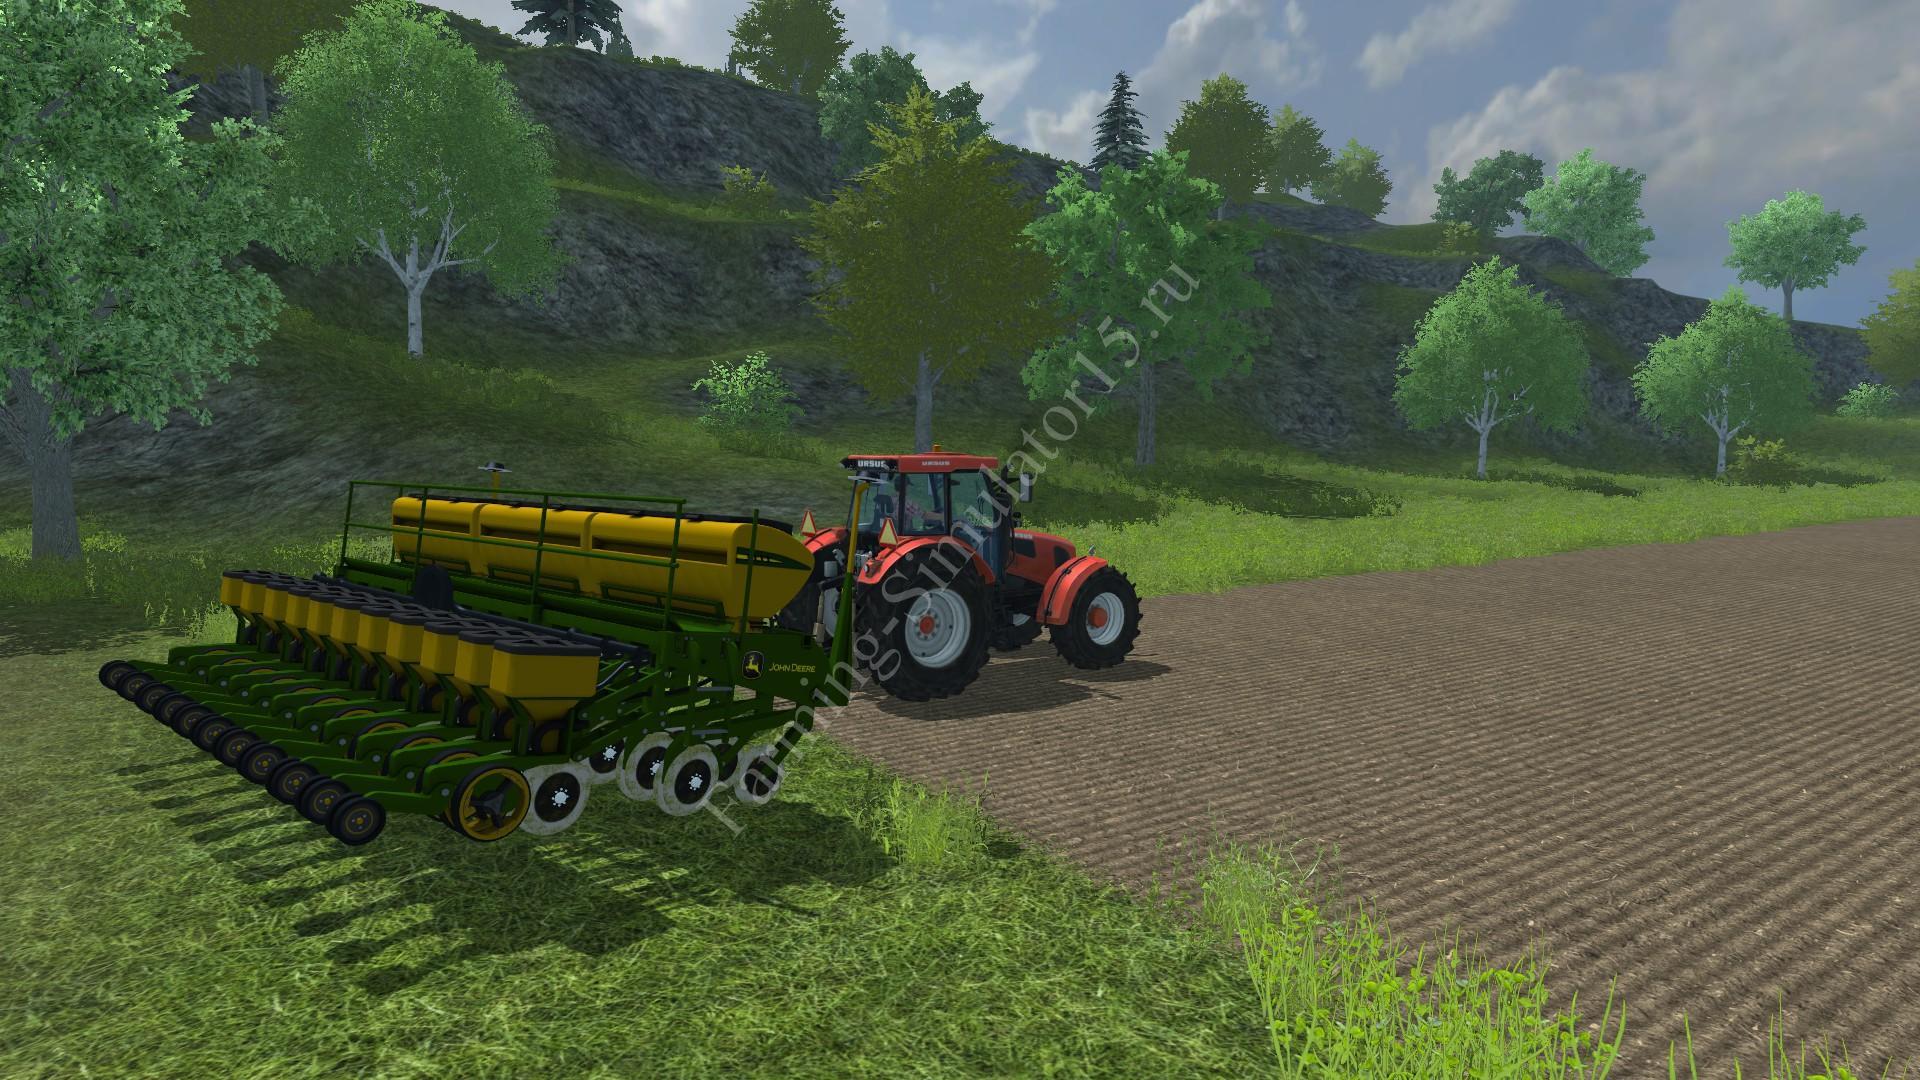 Видео мод сеялки John Deere 1111 v 1.5 Farming Simulator 2013, Farming Simulator 13